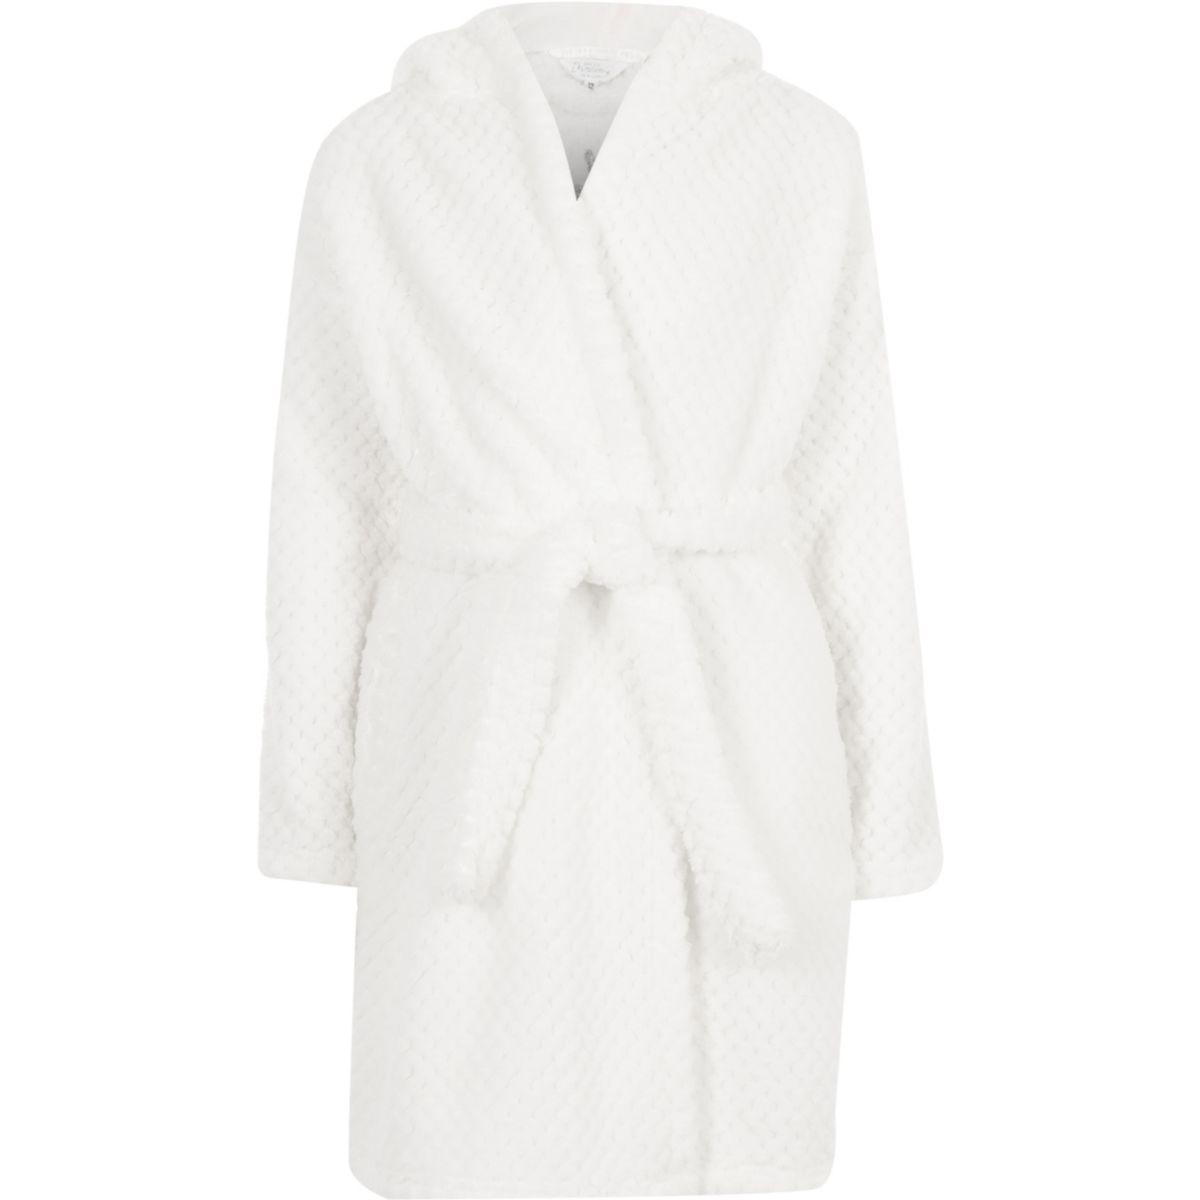 Girls white unicorn dressing gown - Pyjamas & Underwear - girls